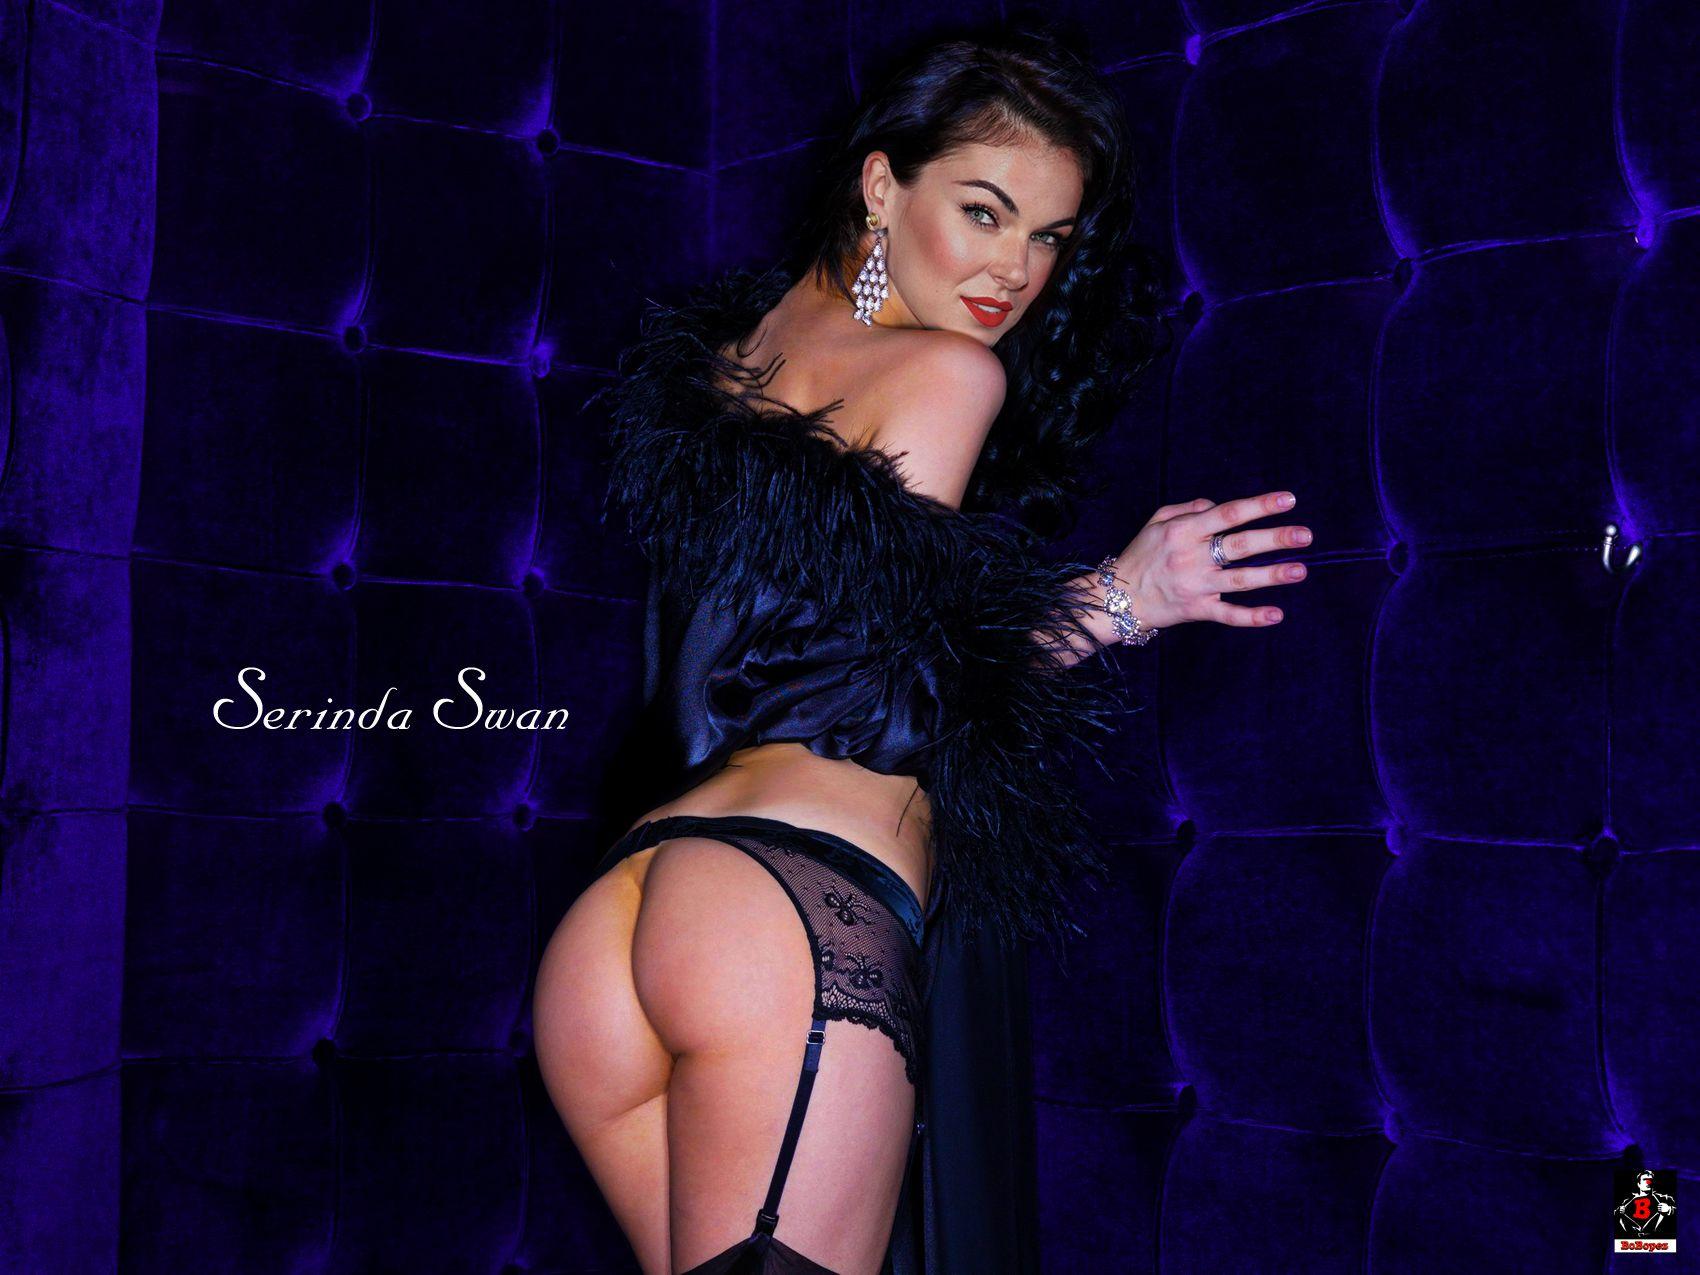 Erotica Serinda Swan nudes (75 fotos) Porno, Snapchat, swimsuit